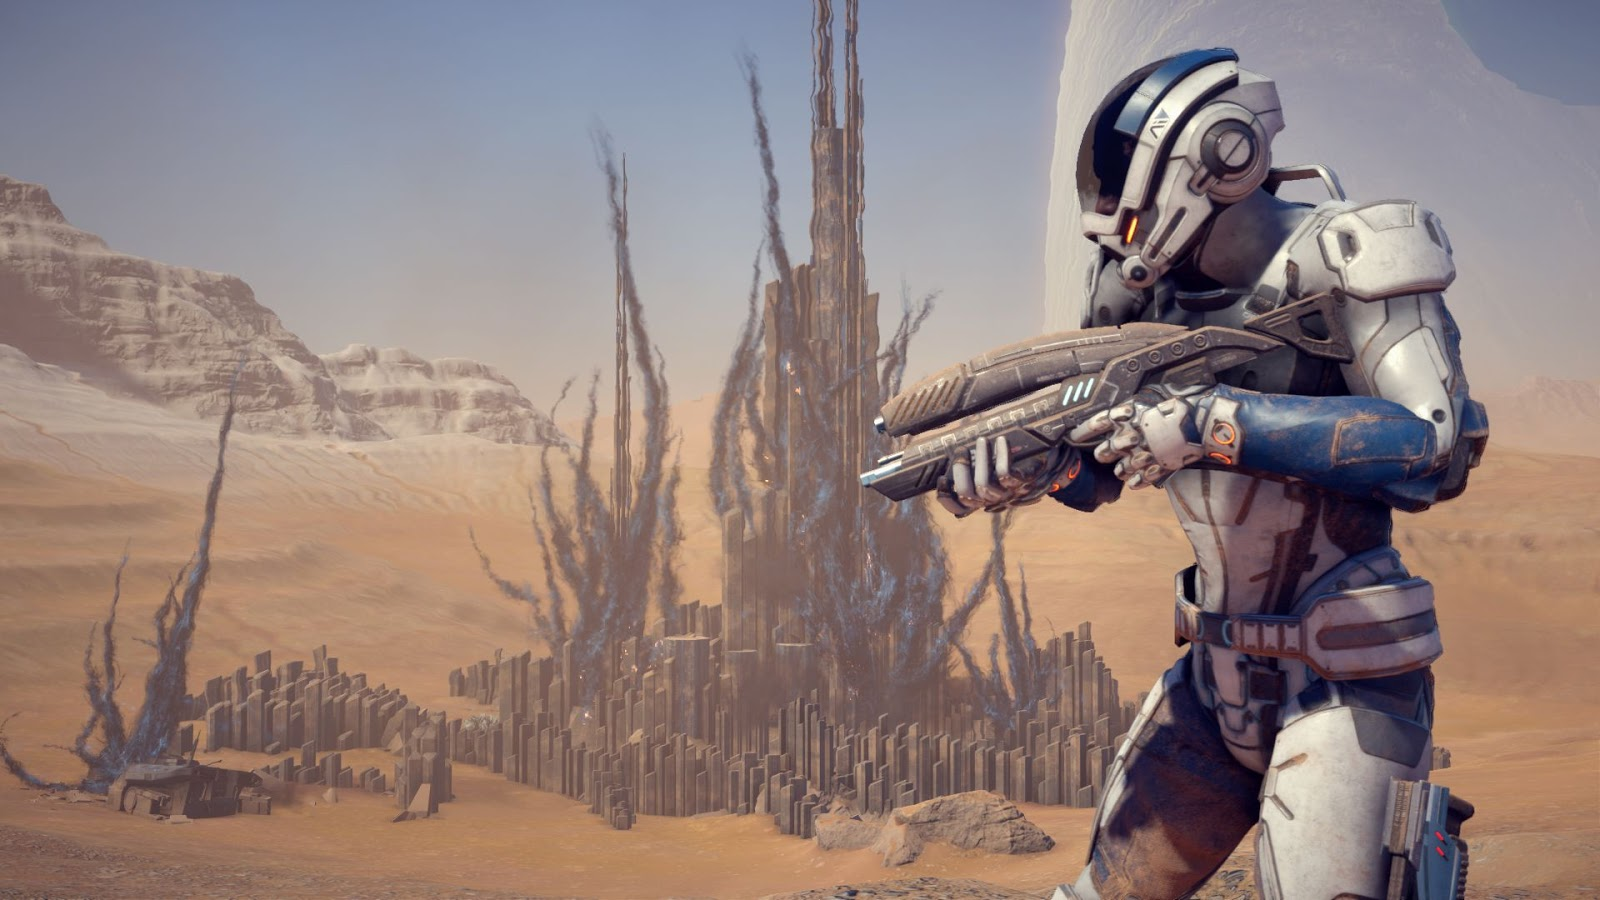 Mass Effect Andromeda ESPAÑOL PC Full + Update 1.0.0.5 + CRACKFIX (CPY) + REPACK PROPER 9 DVD5 (JPW) 8